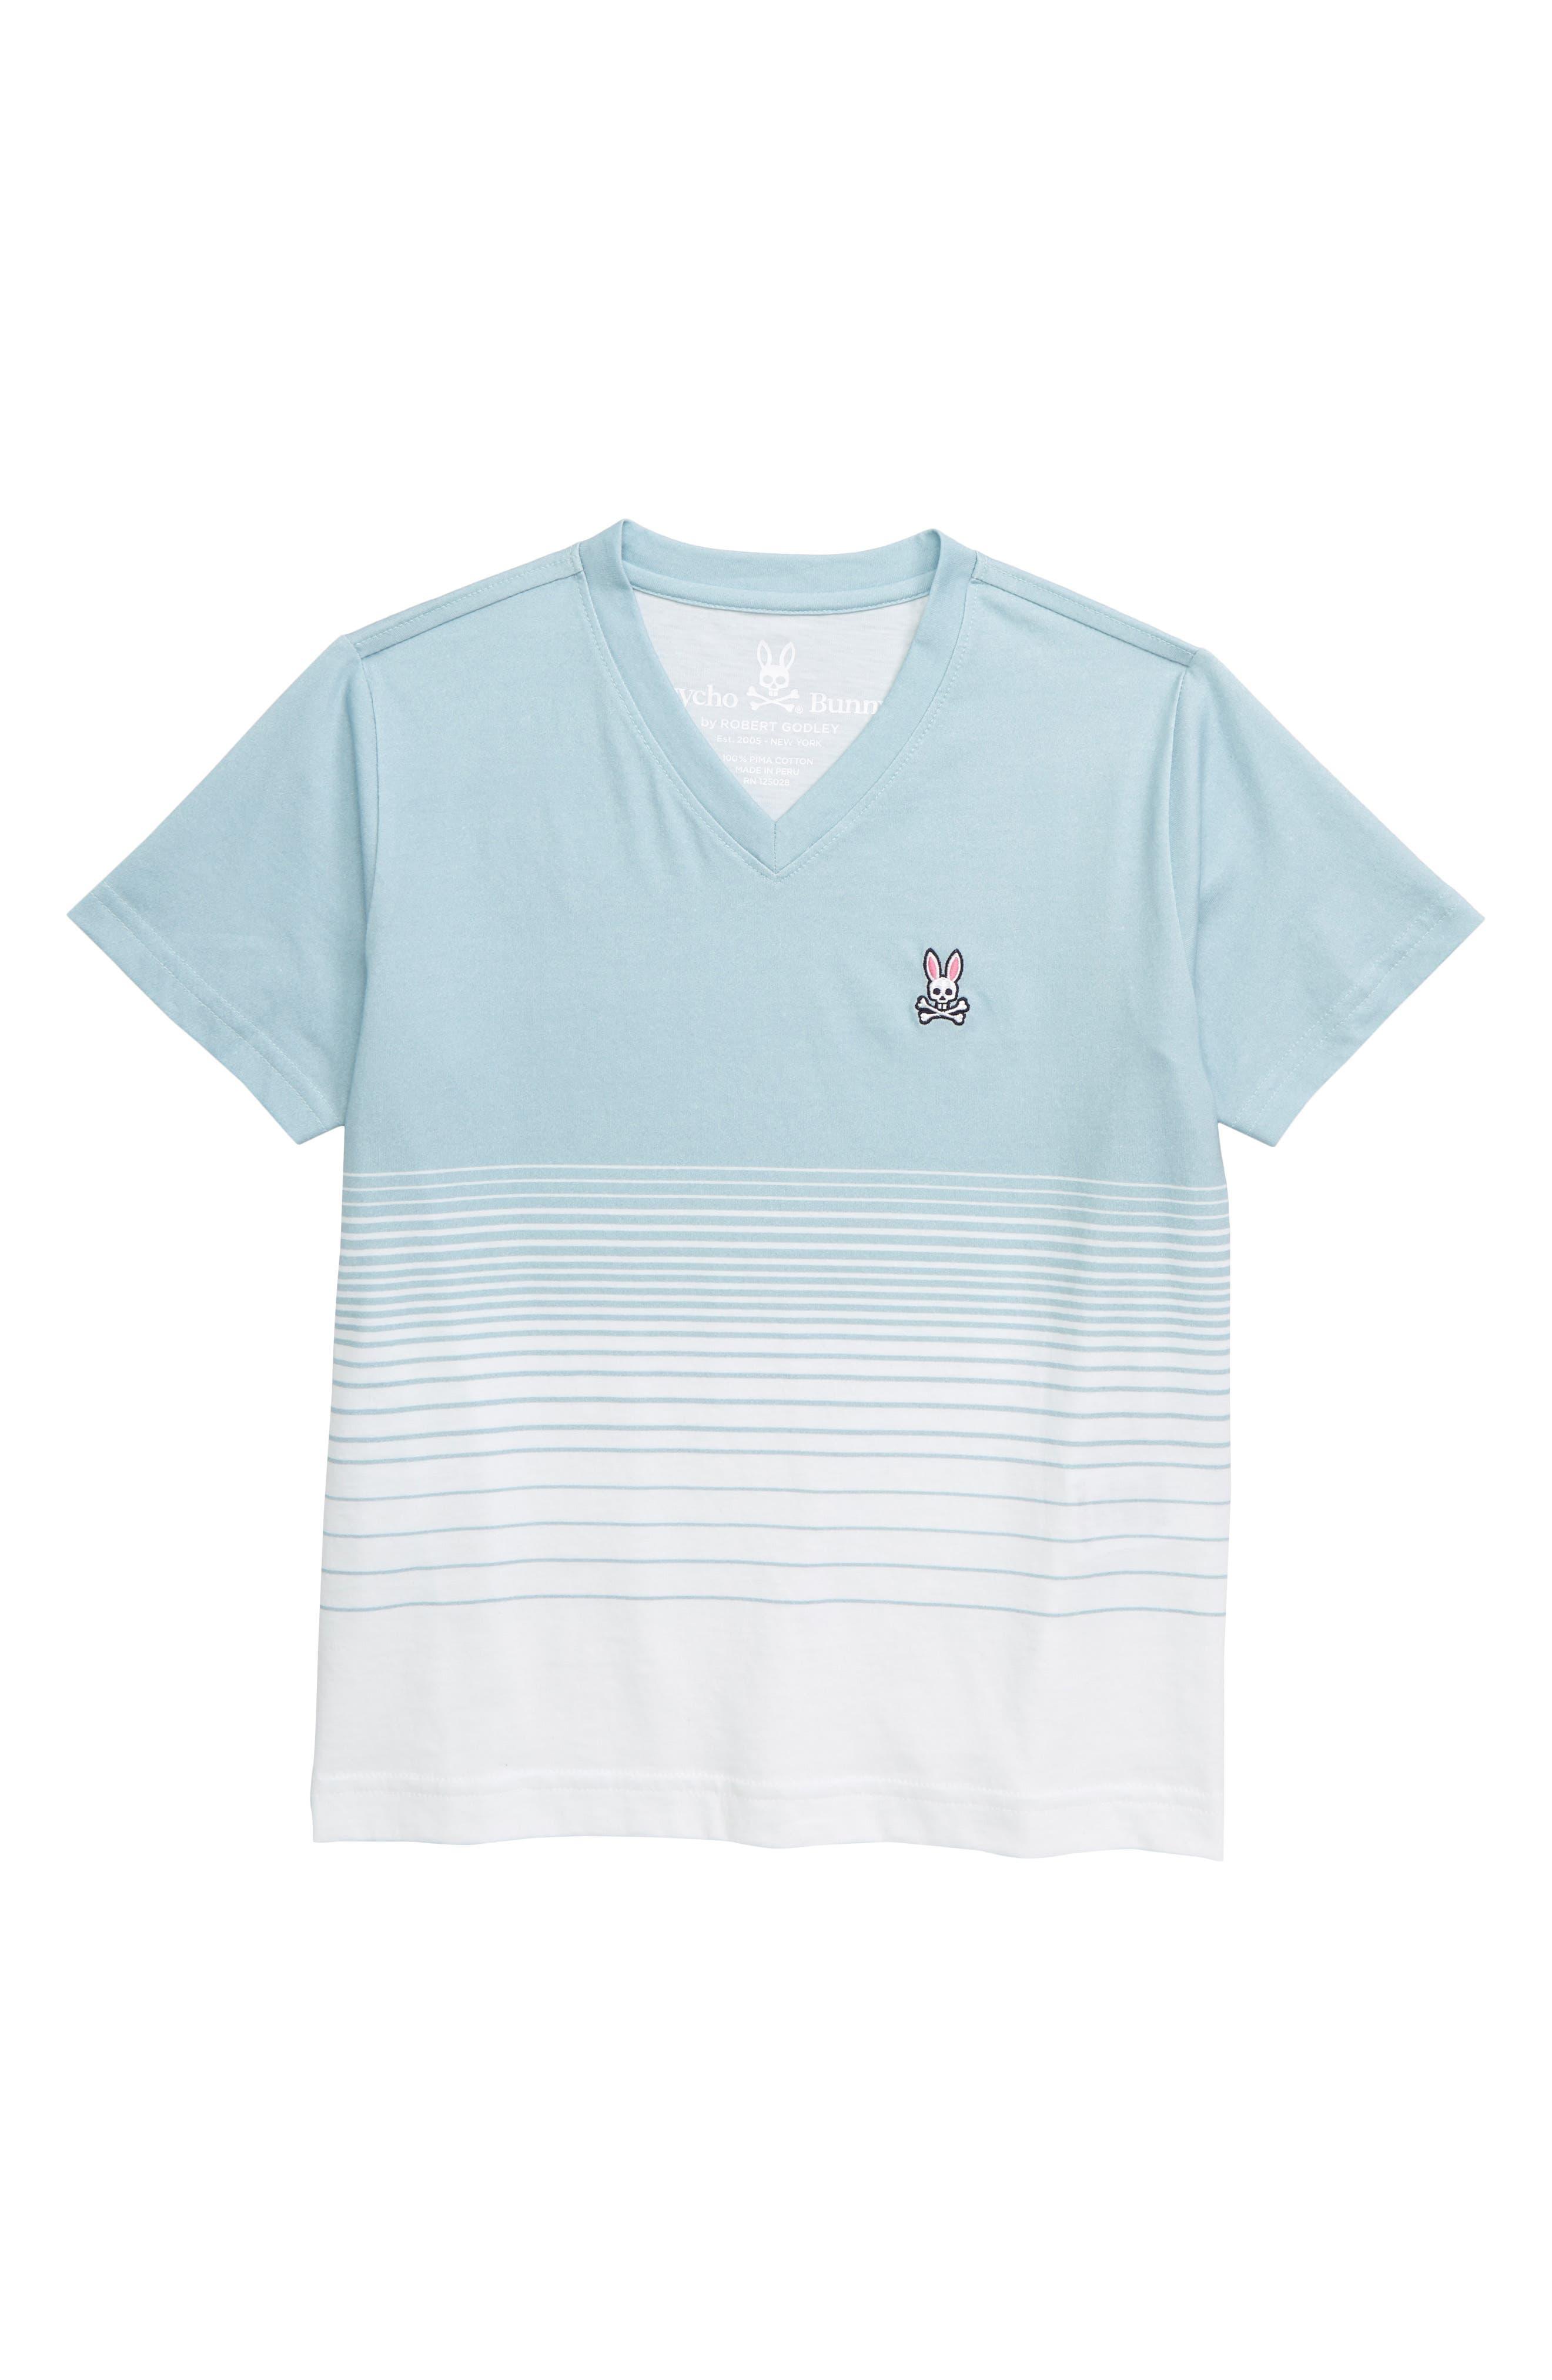 PSYCHO BUNNY, Warrington V-Neck T-Shirt, Main thumbnail 1, color, SEAFOAM